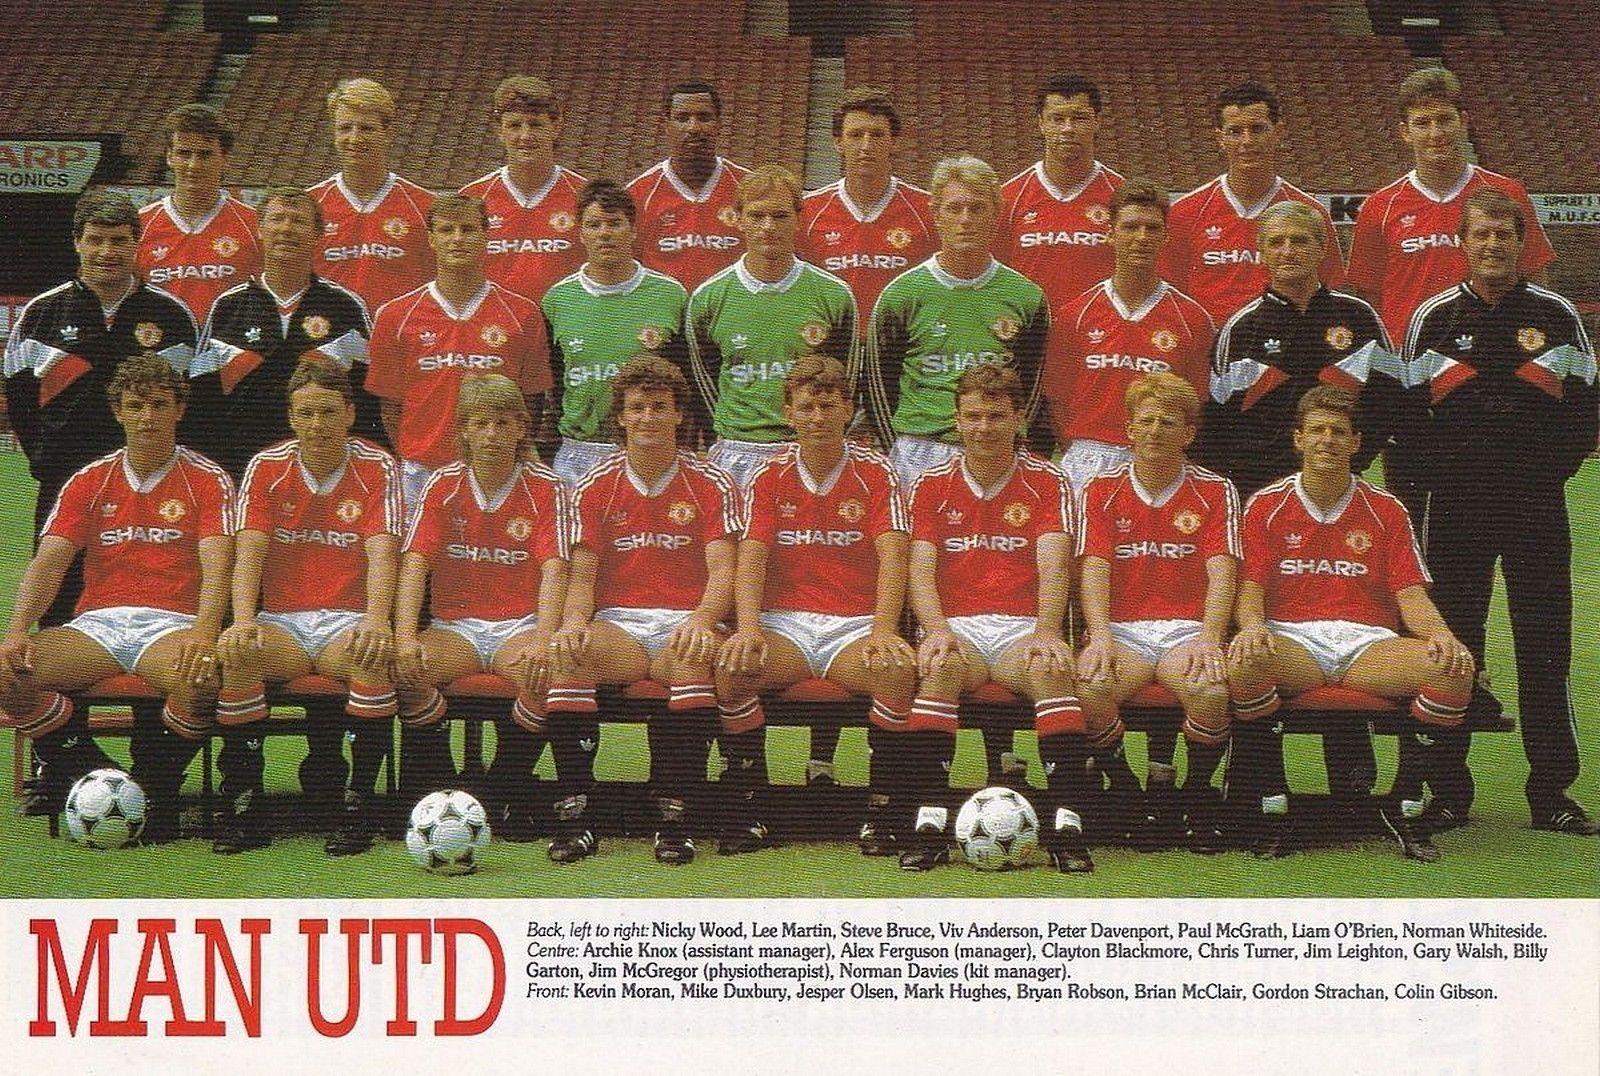 Man Utd Football Team Photo 1988 89 Season Manchester United Team Manchester United Football Manchester United